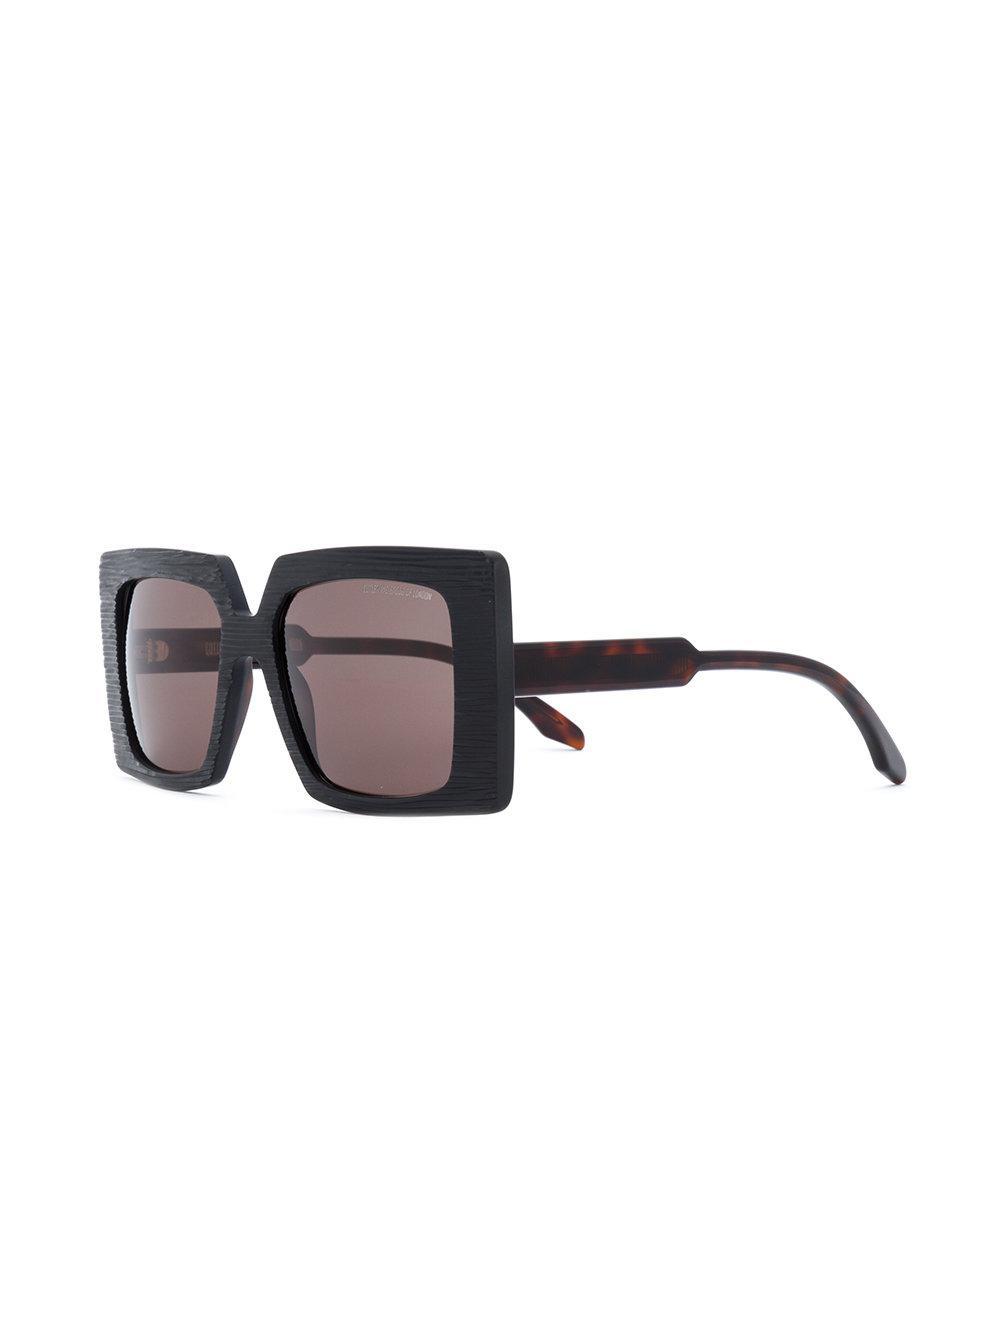 Cutler & Gross Oversized Square Sunglasses in Black